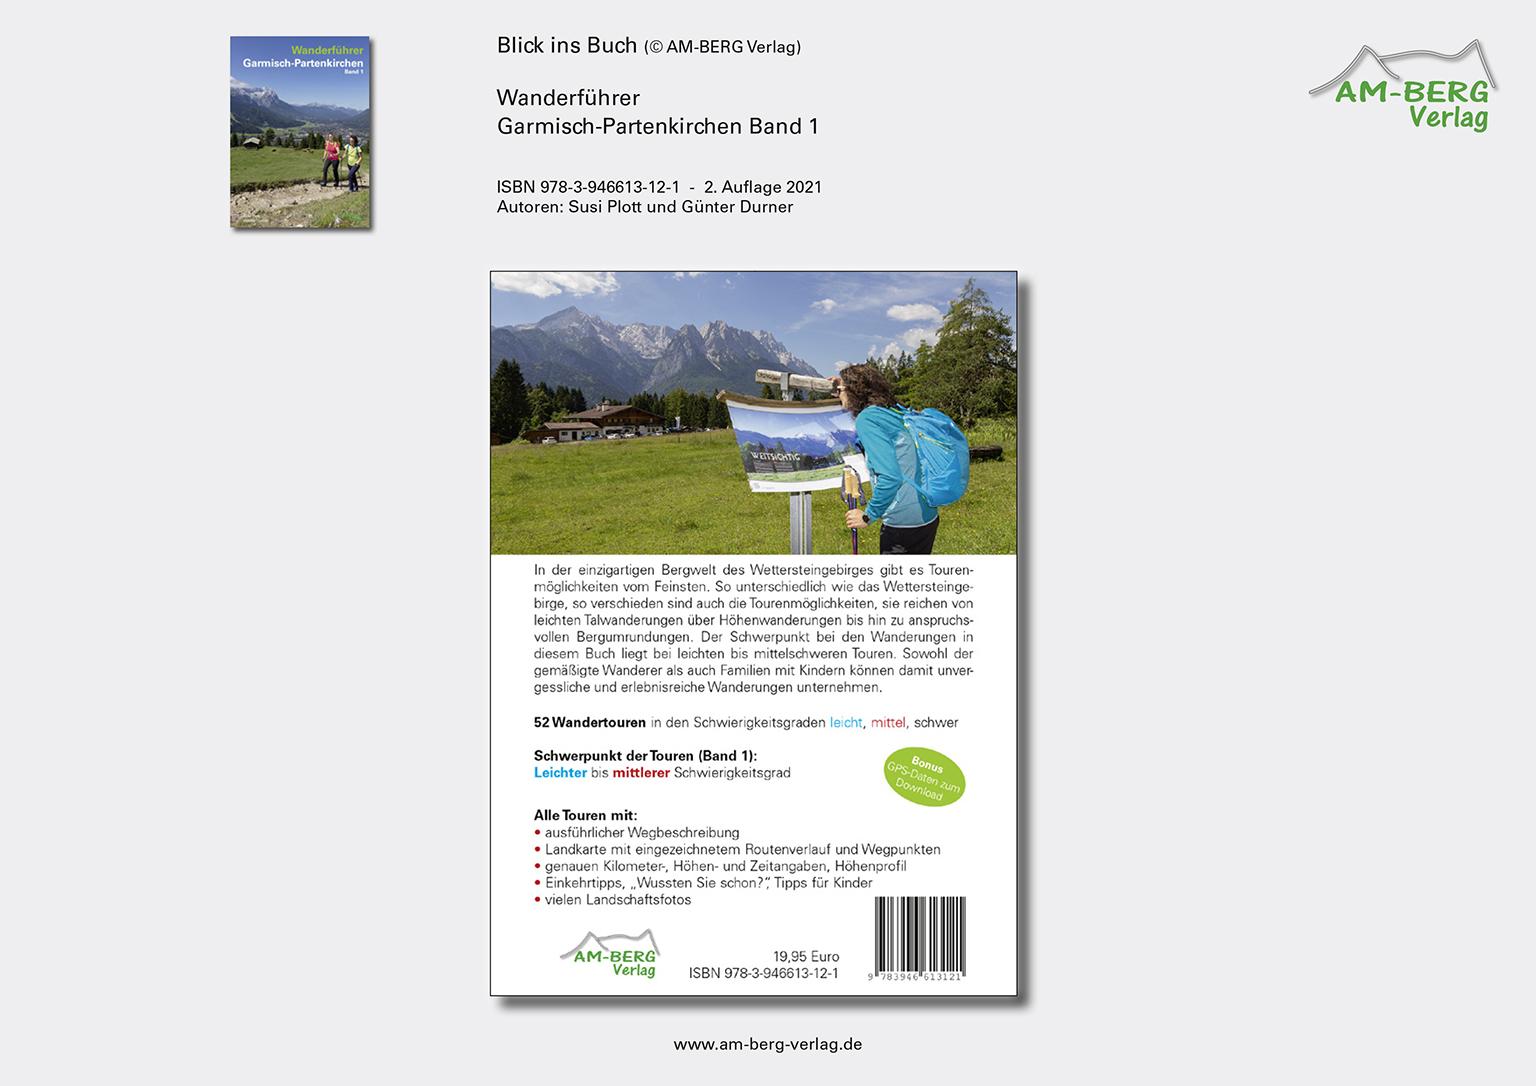 Wanderführer Garmisch-Partenkirchen Band 1_Rückseite Buch